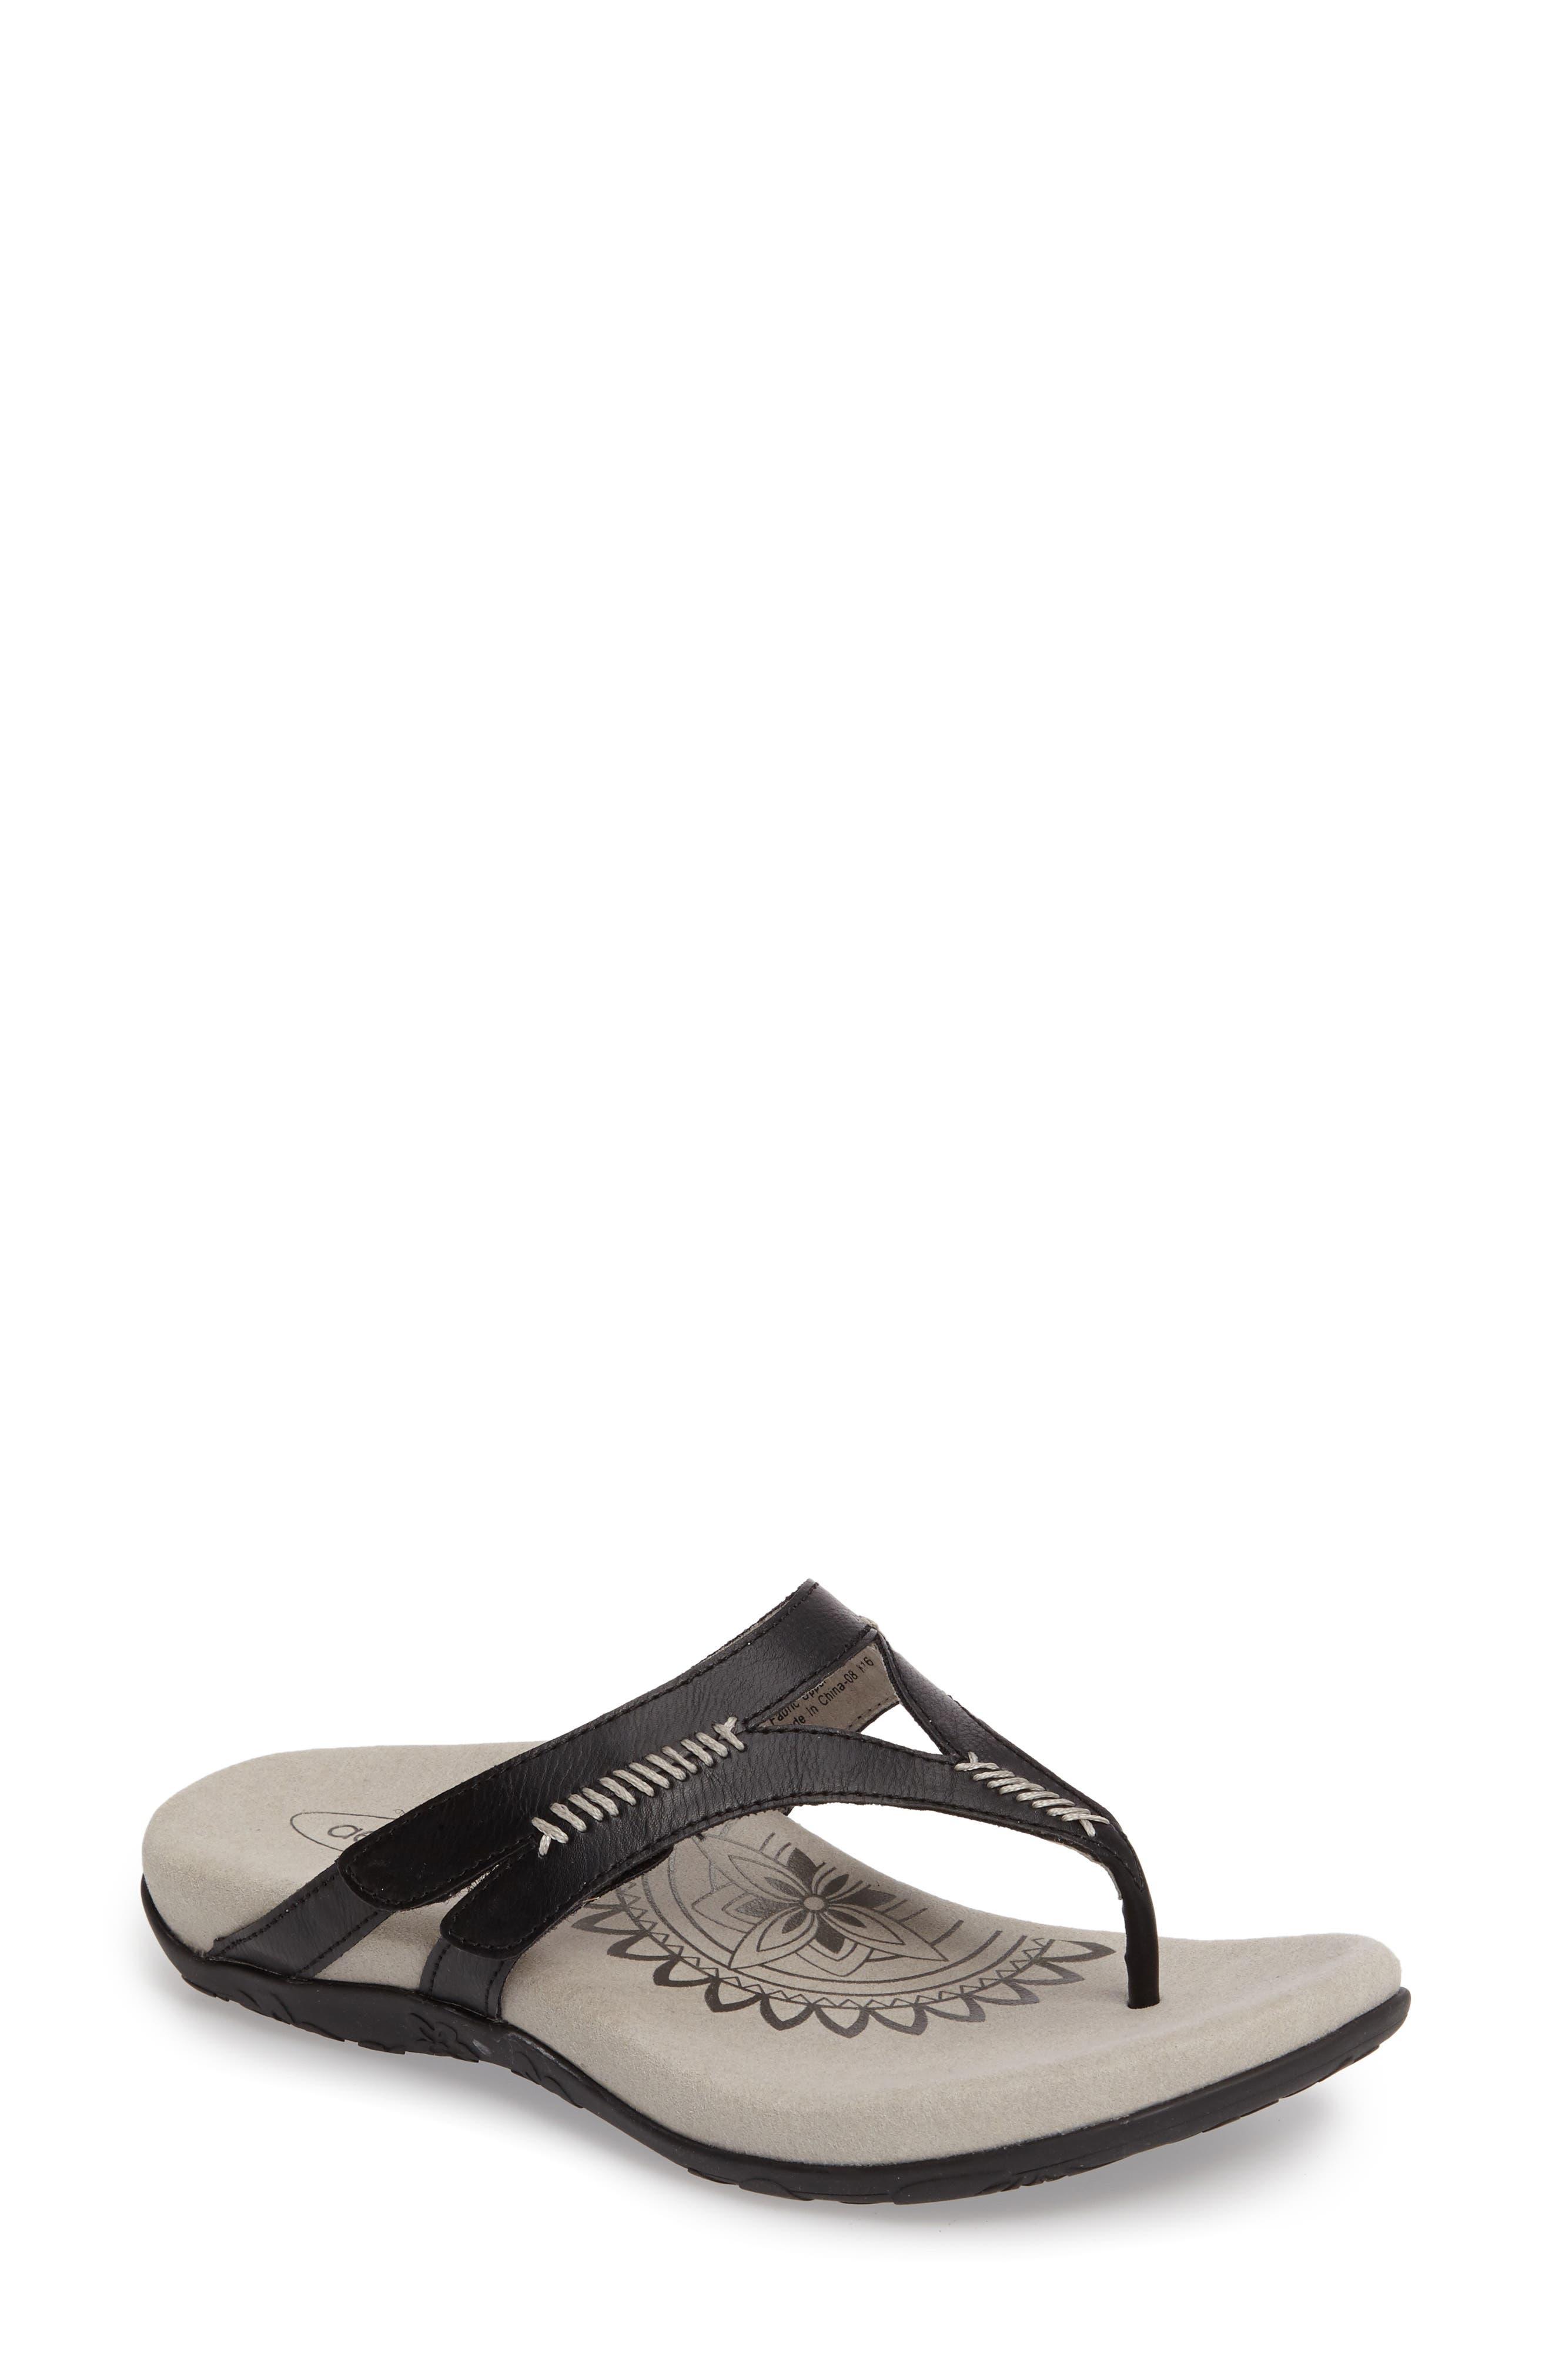 Celia Flip Flop,                         Main,                         color, Black Leather